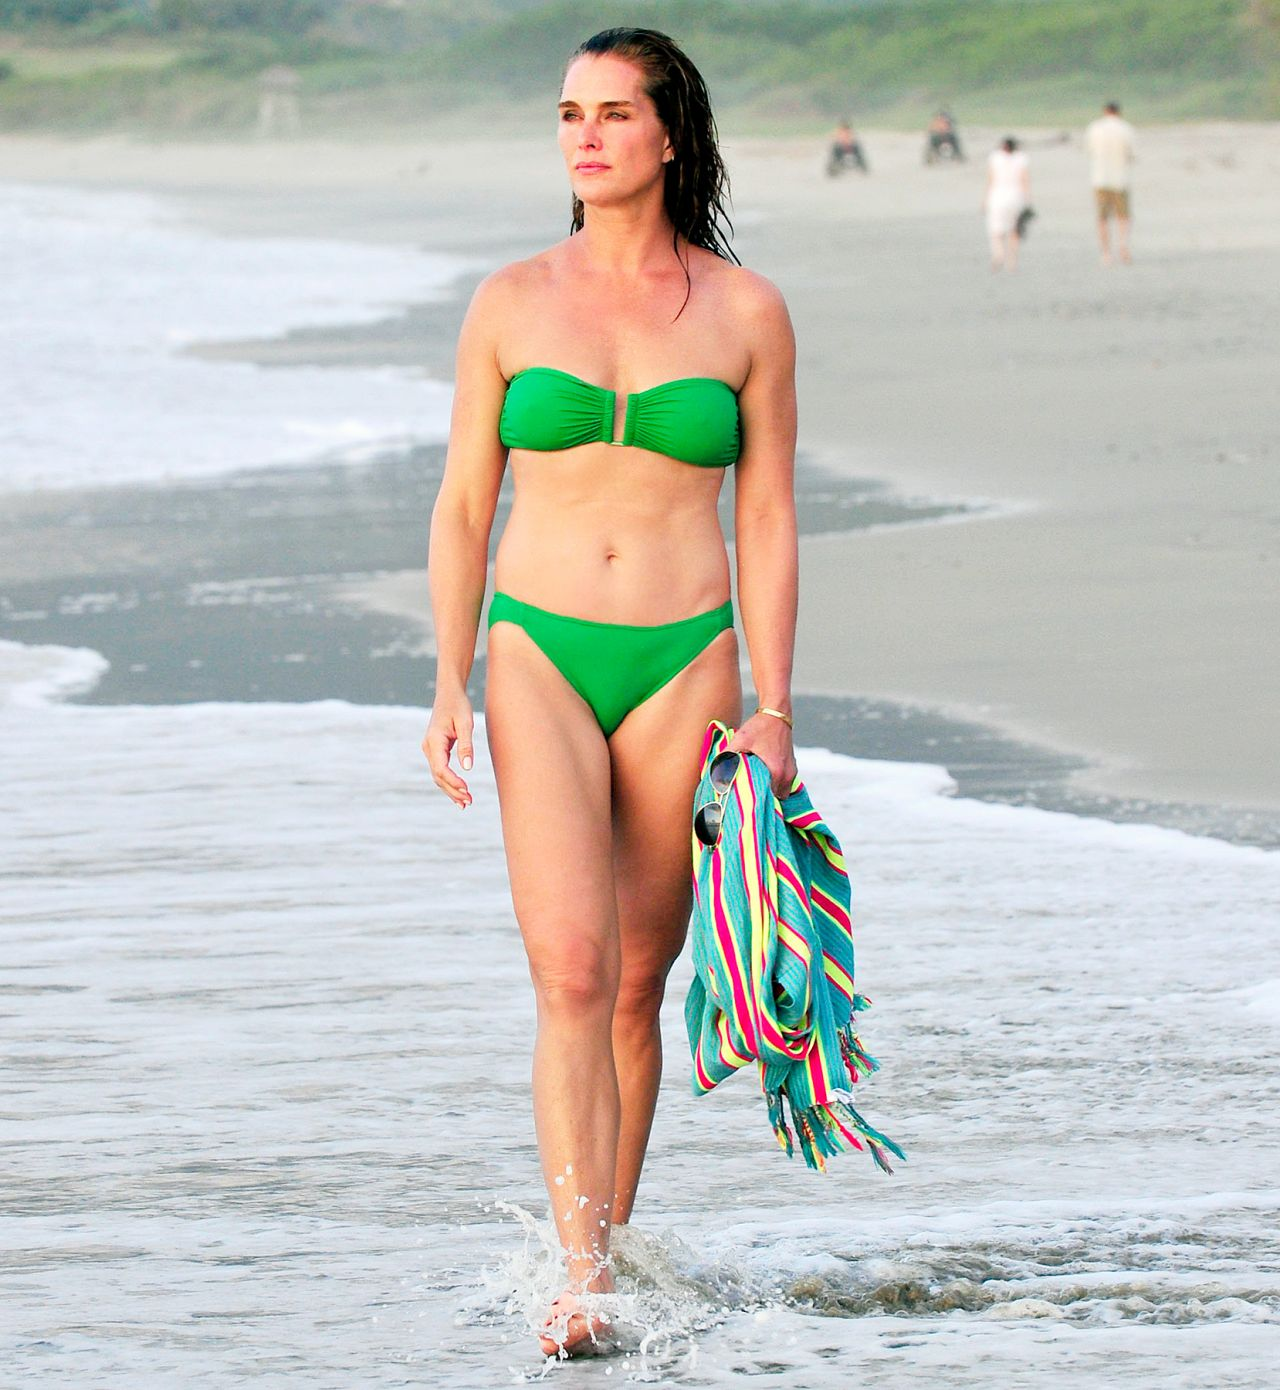 Bikini Brooke Shields nudes (79 photos), Pussy, Hot, Feet, cleavage 2020